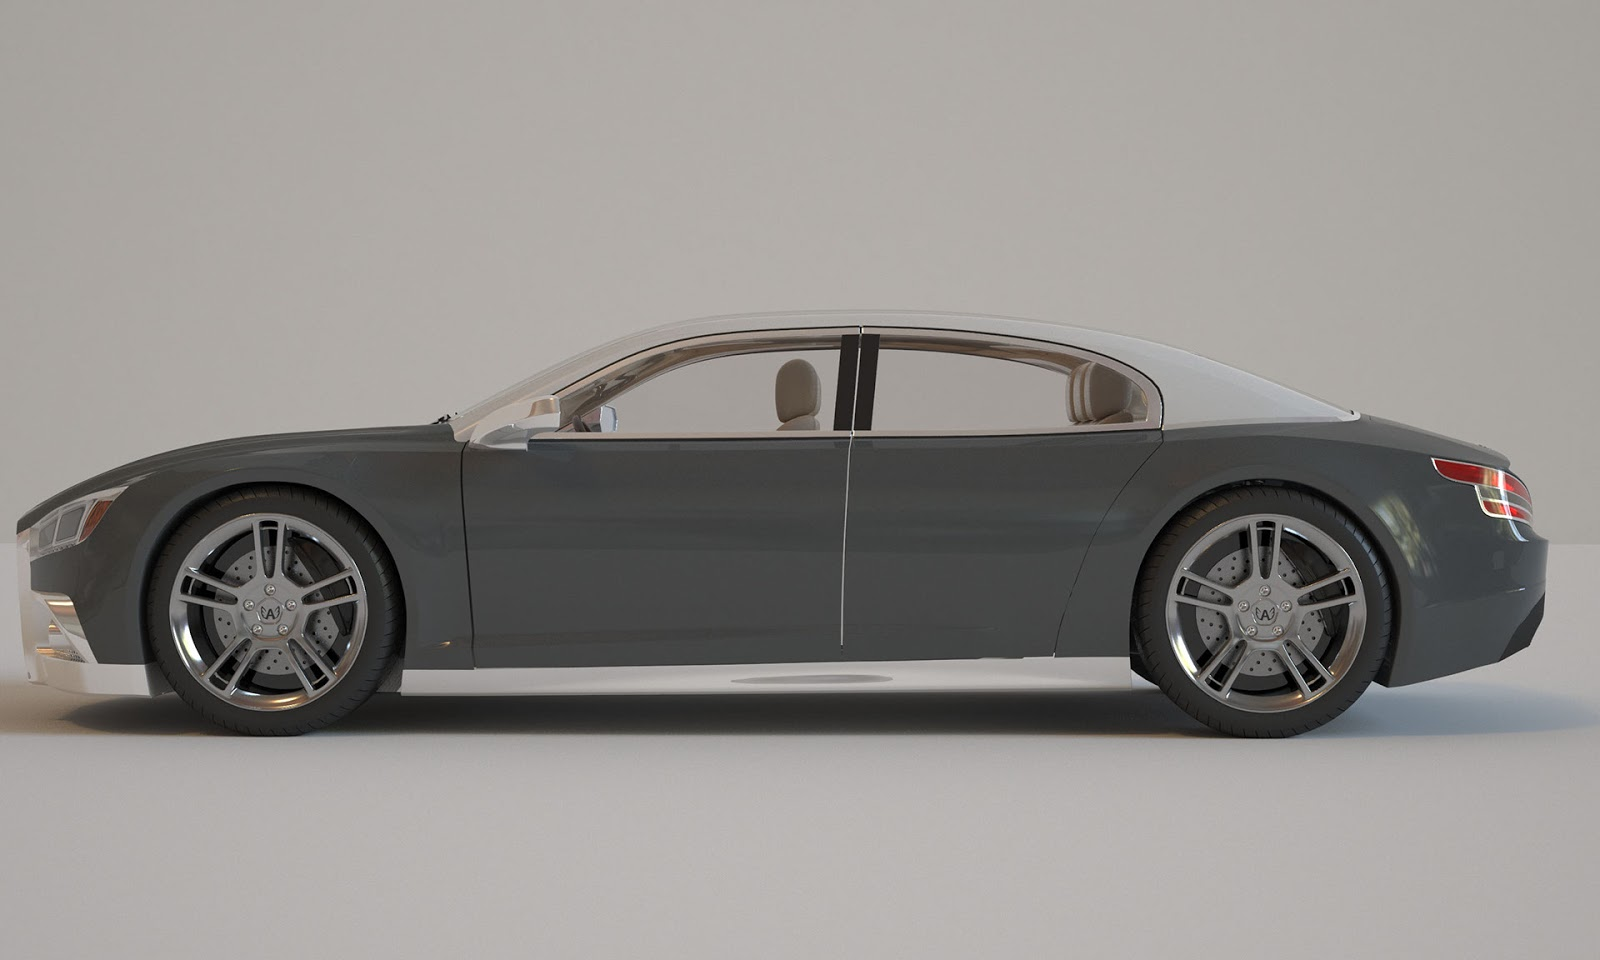 gaz-volga-2020-rendering-6